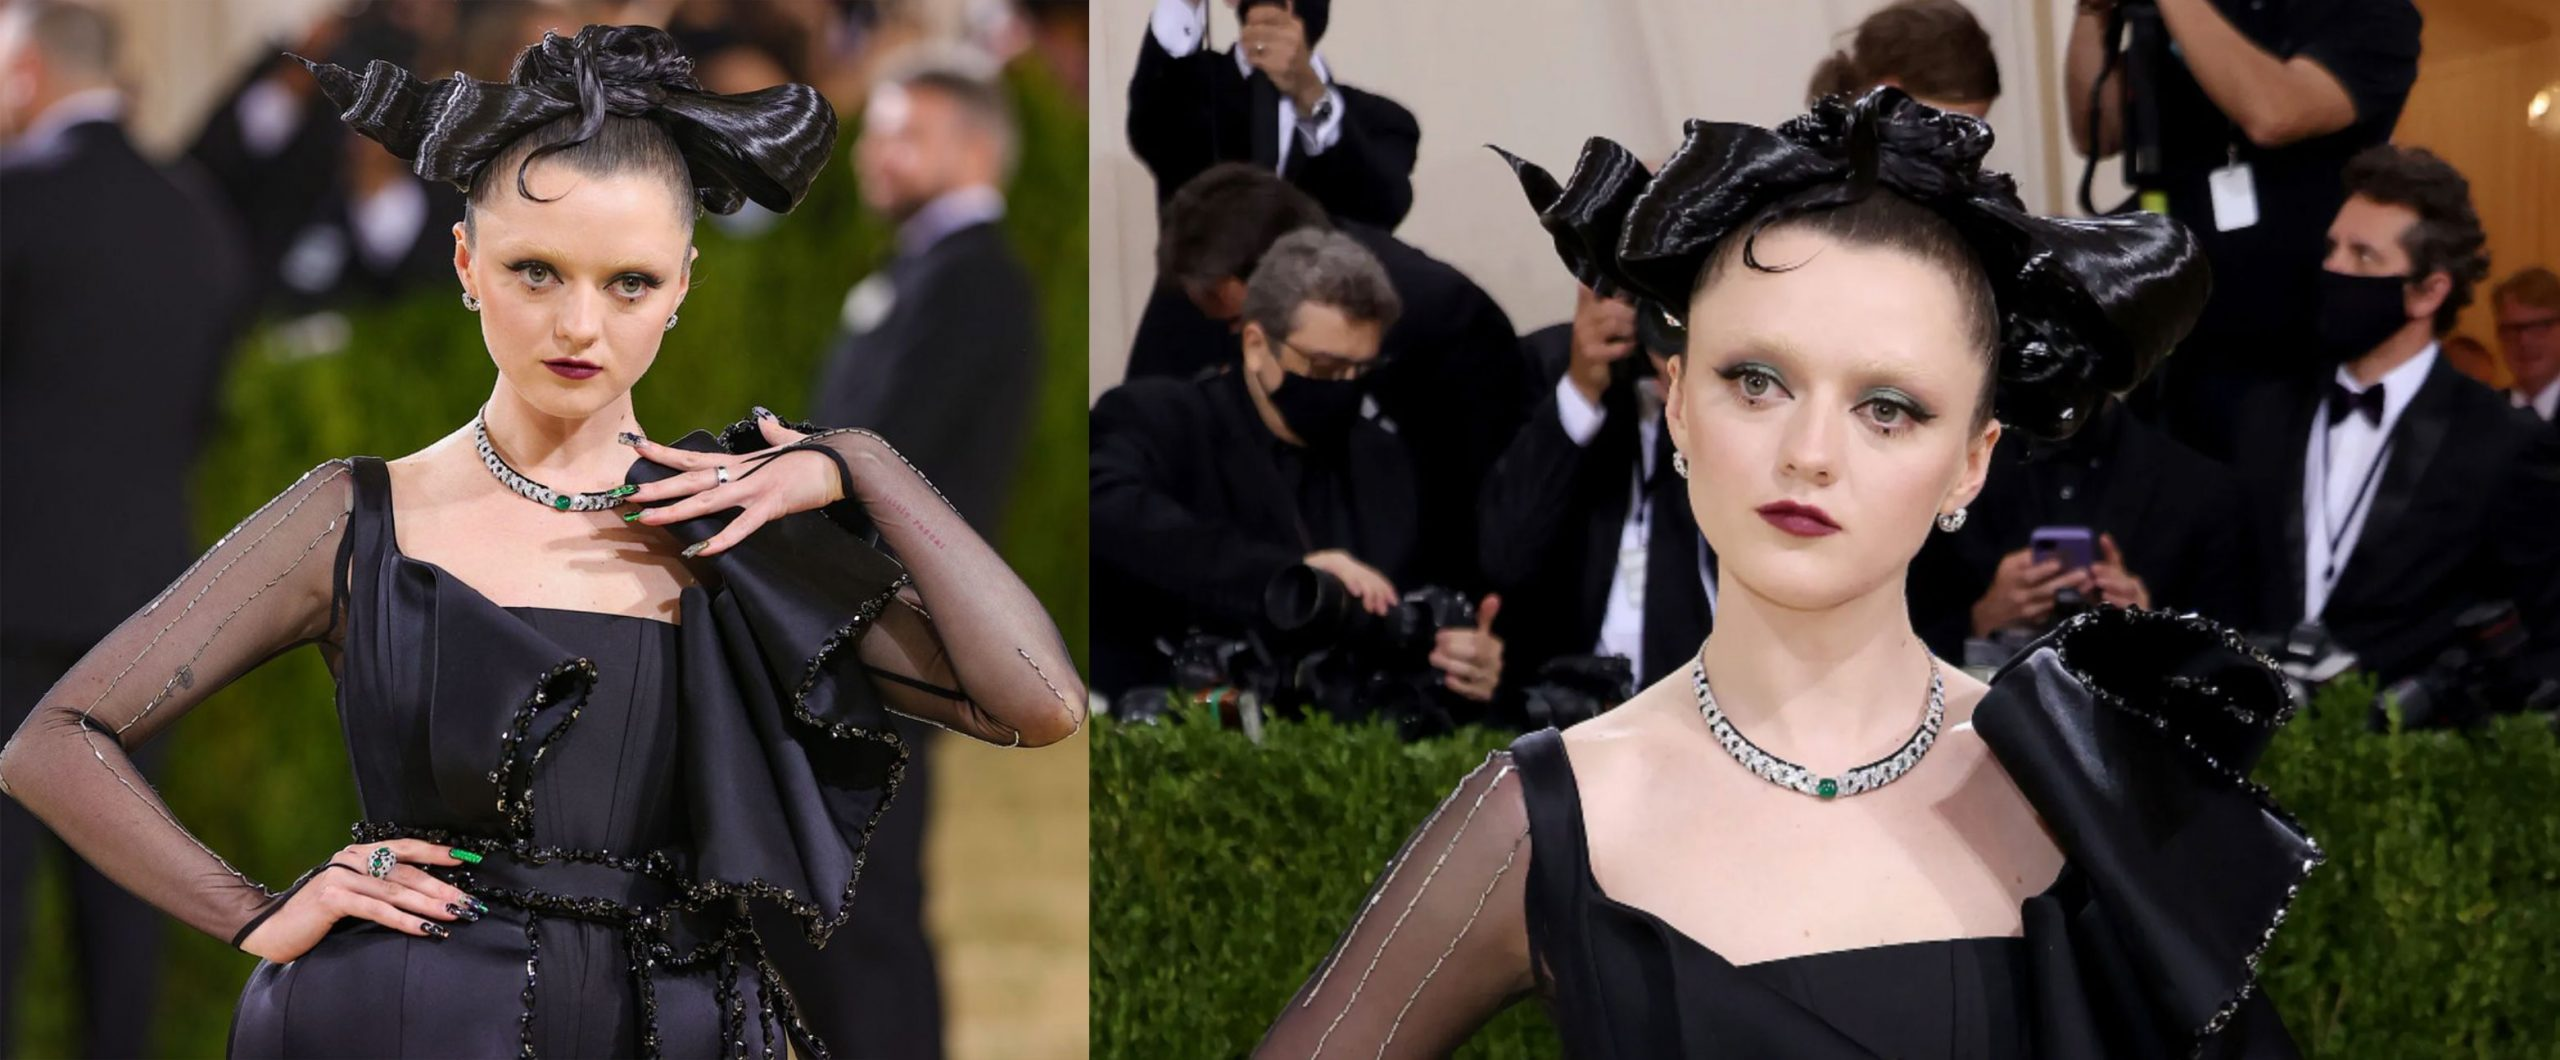 Maisie Williams jewellery